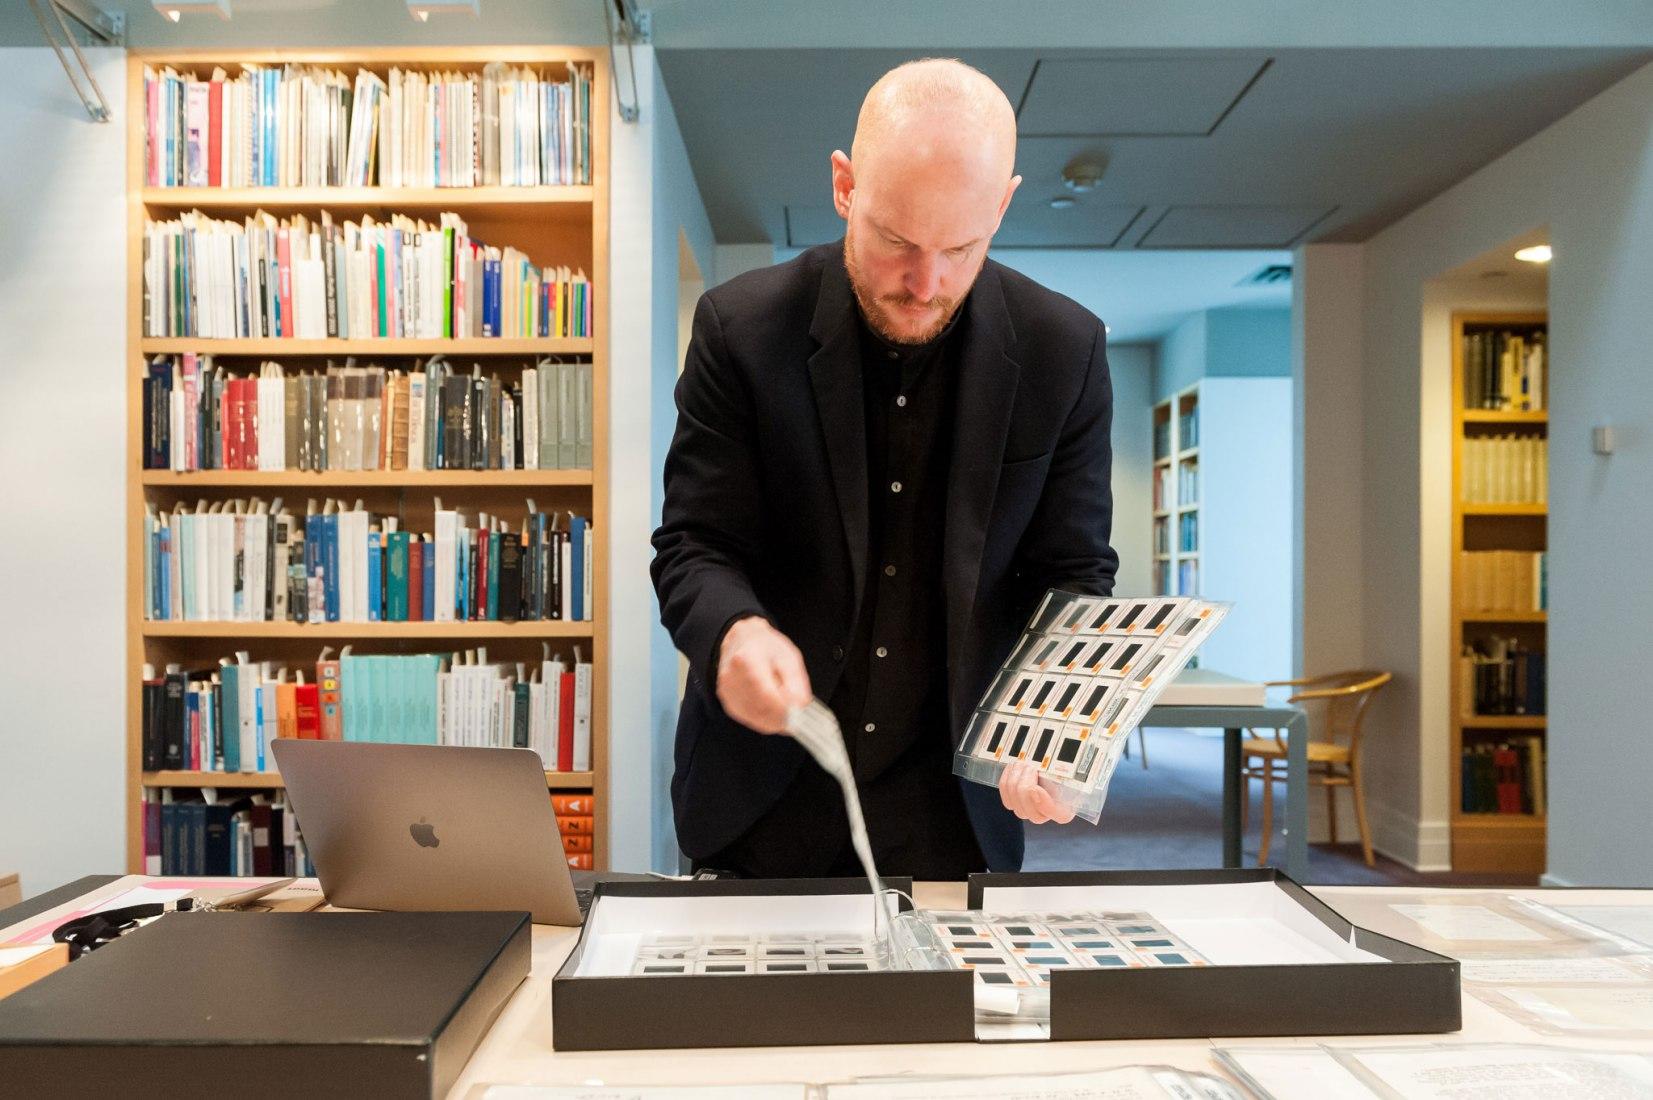 Yann Chateigné revisando la Colección Gordon Matta-Clark, Centro Canadiense de Arquitectura, 2018. Fotografía © CCA